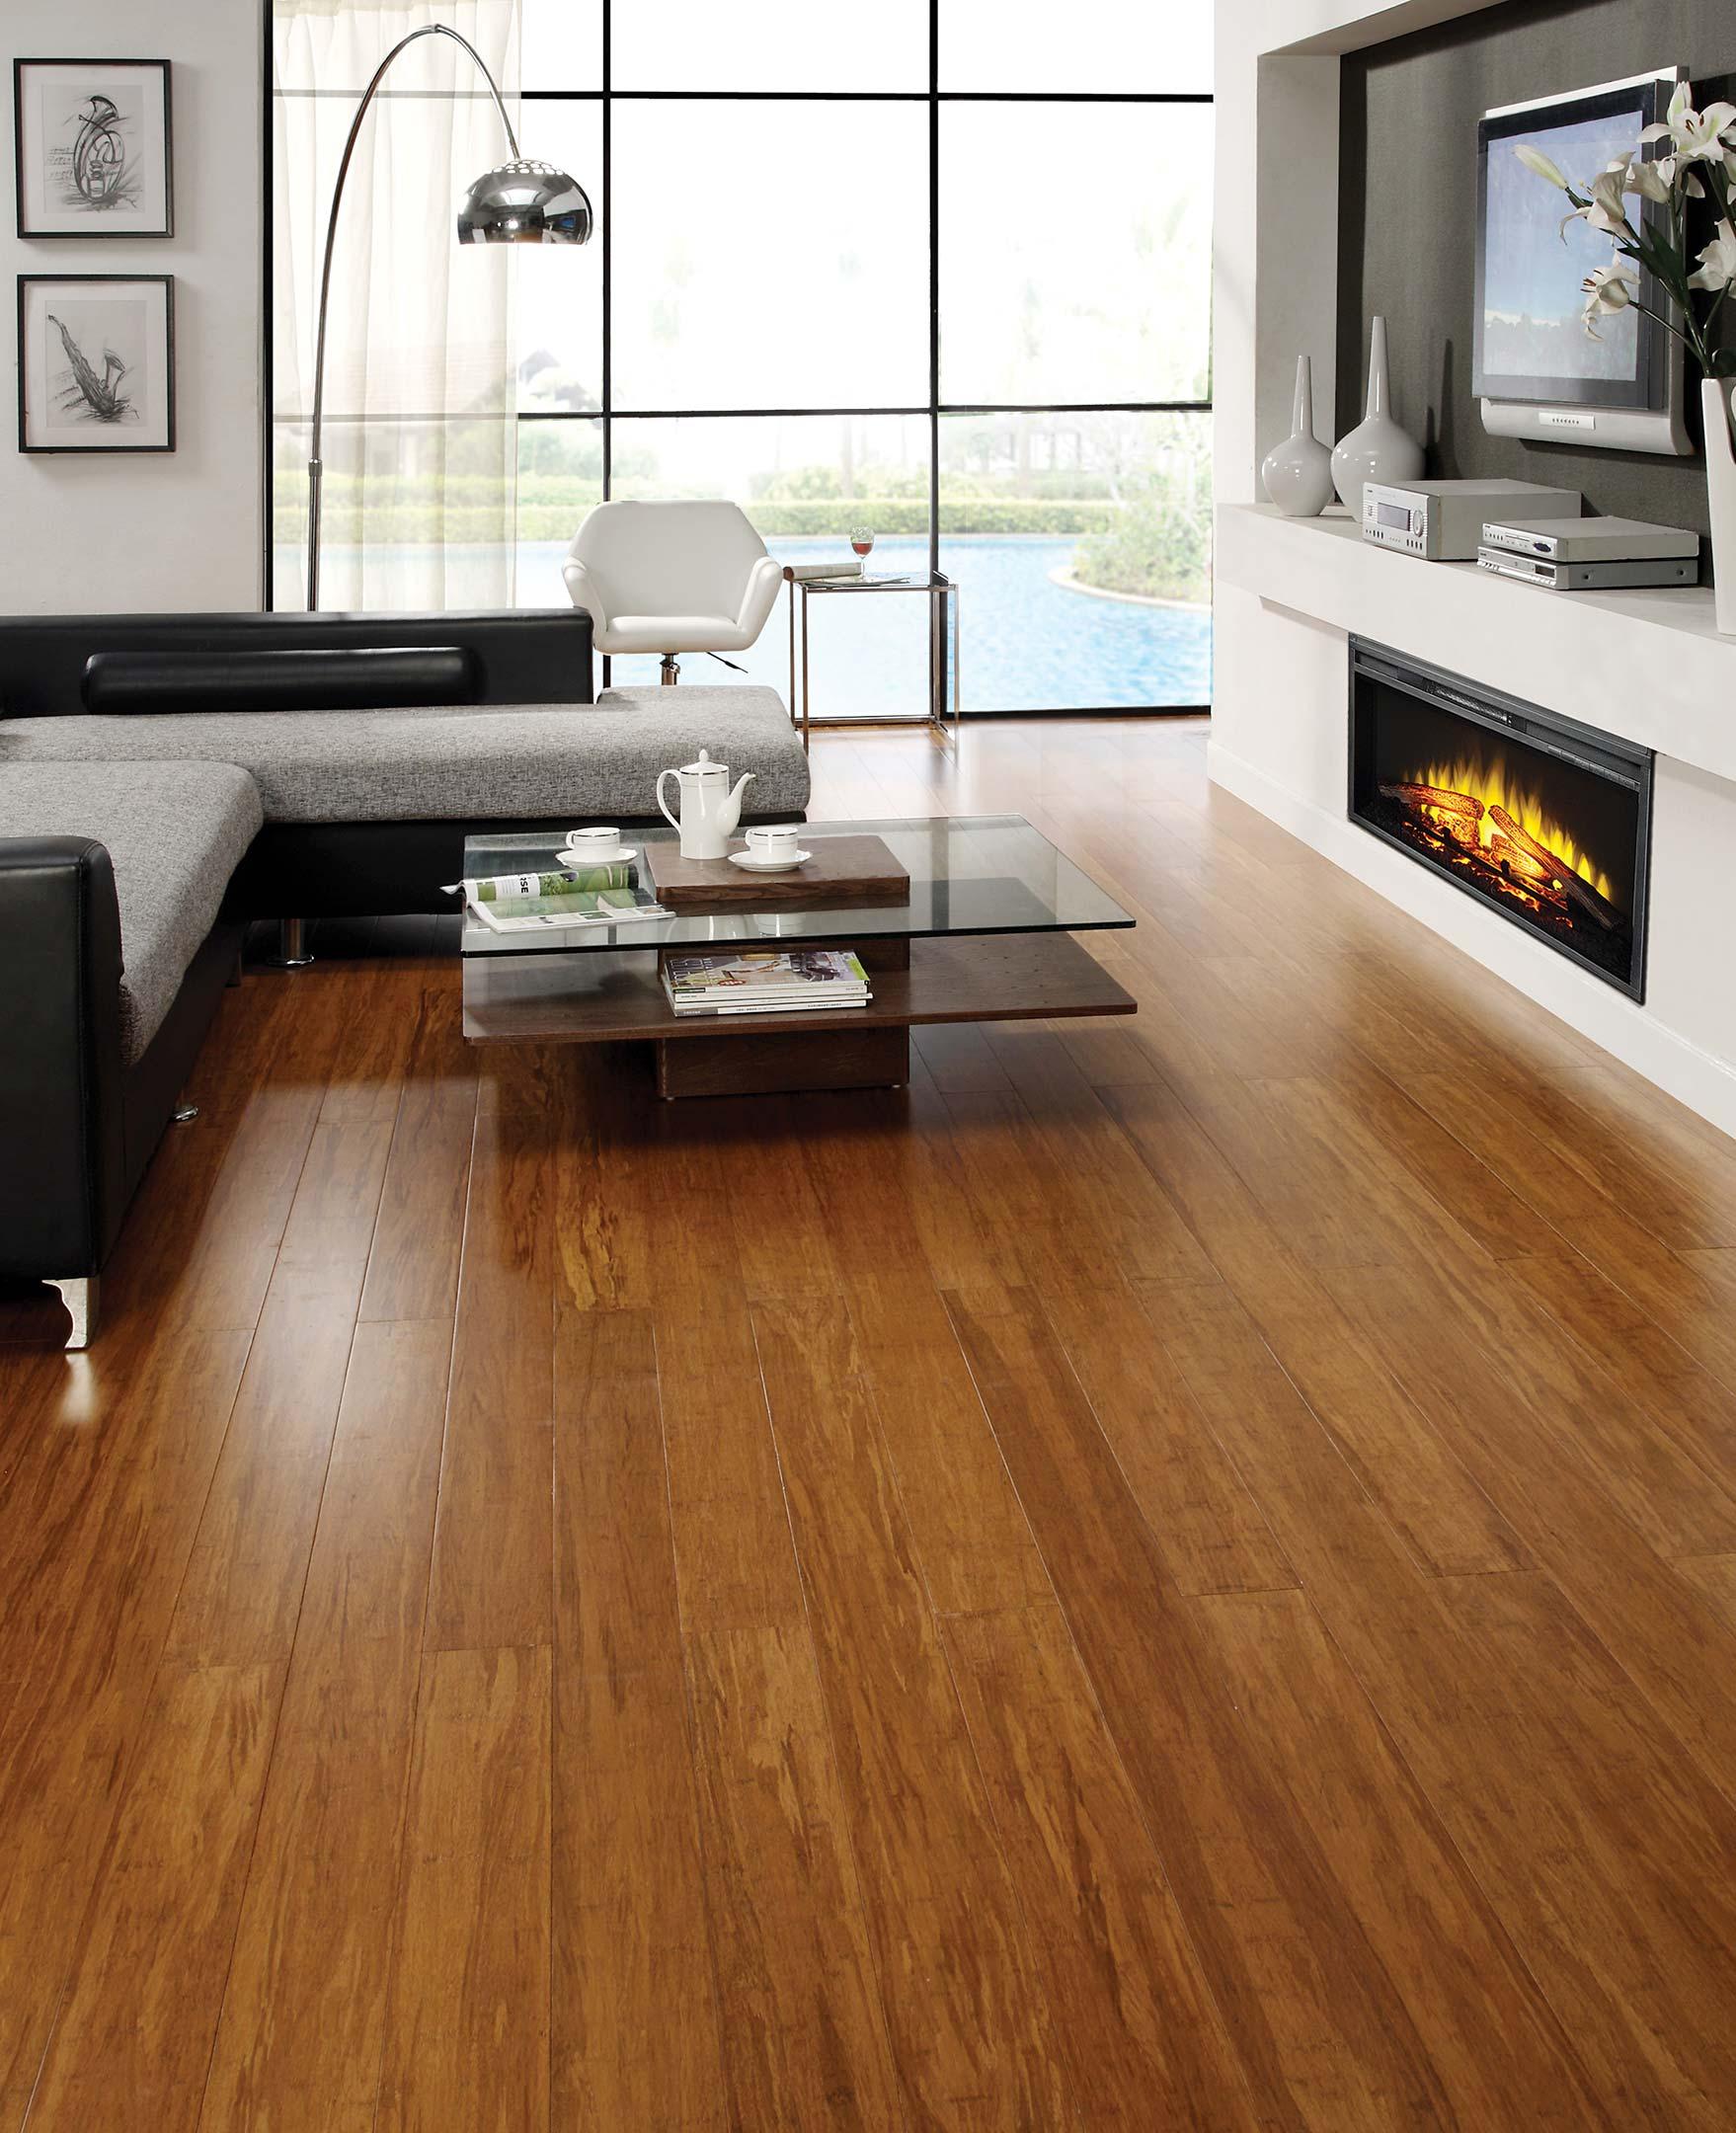 Floor Strand Woven Bamboo